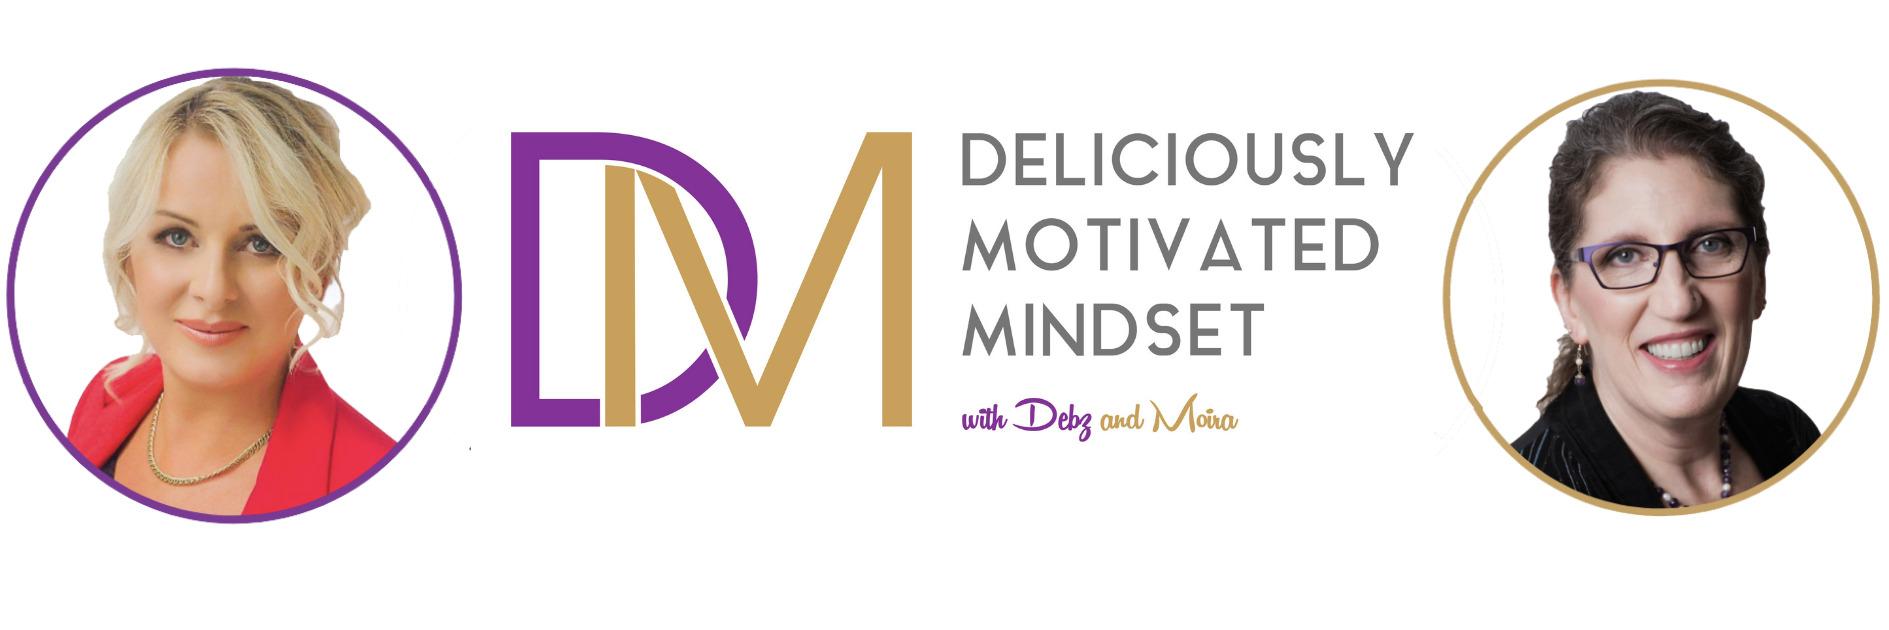 Deliciously Motivated Mindset - Podcast